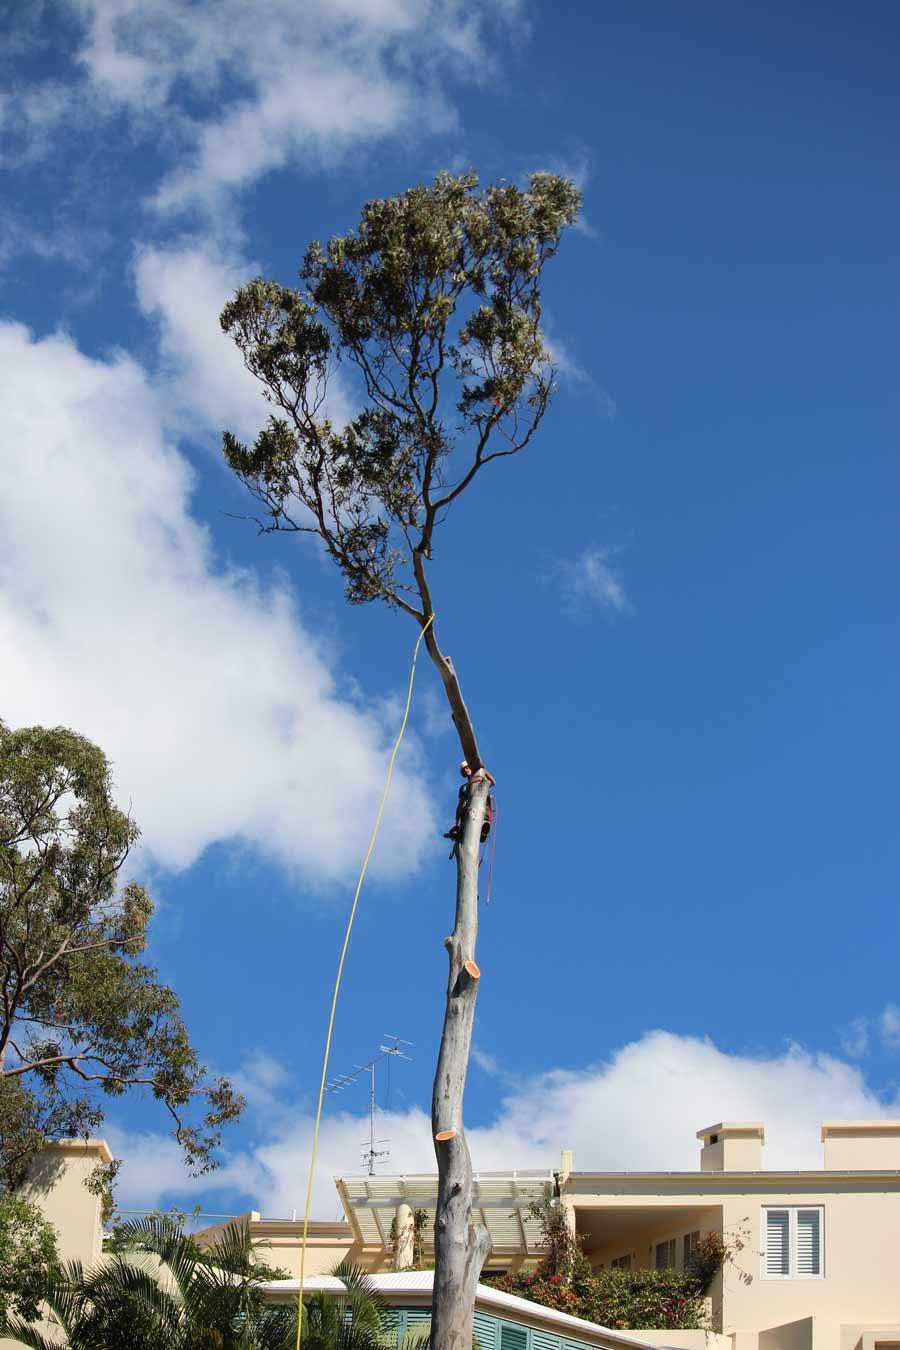 rope around a thin tree